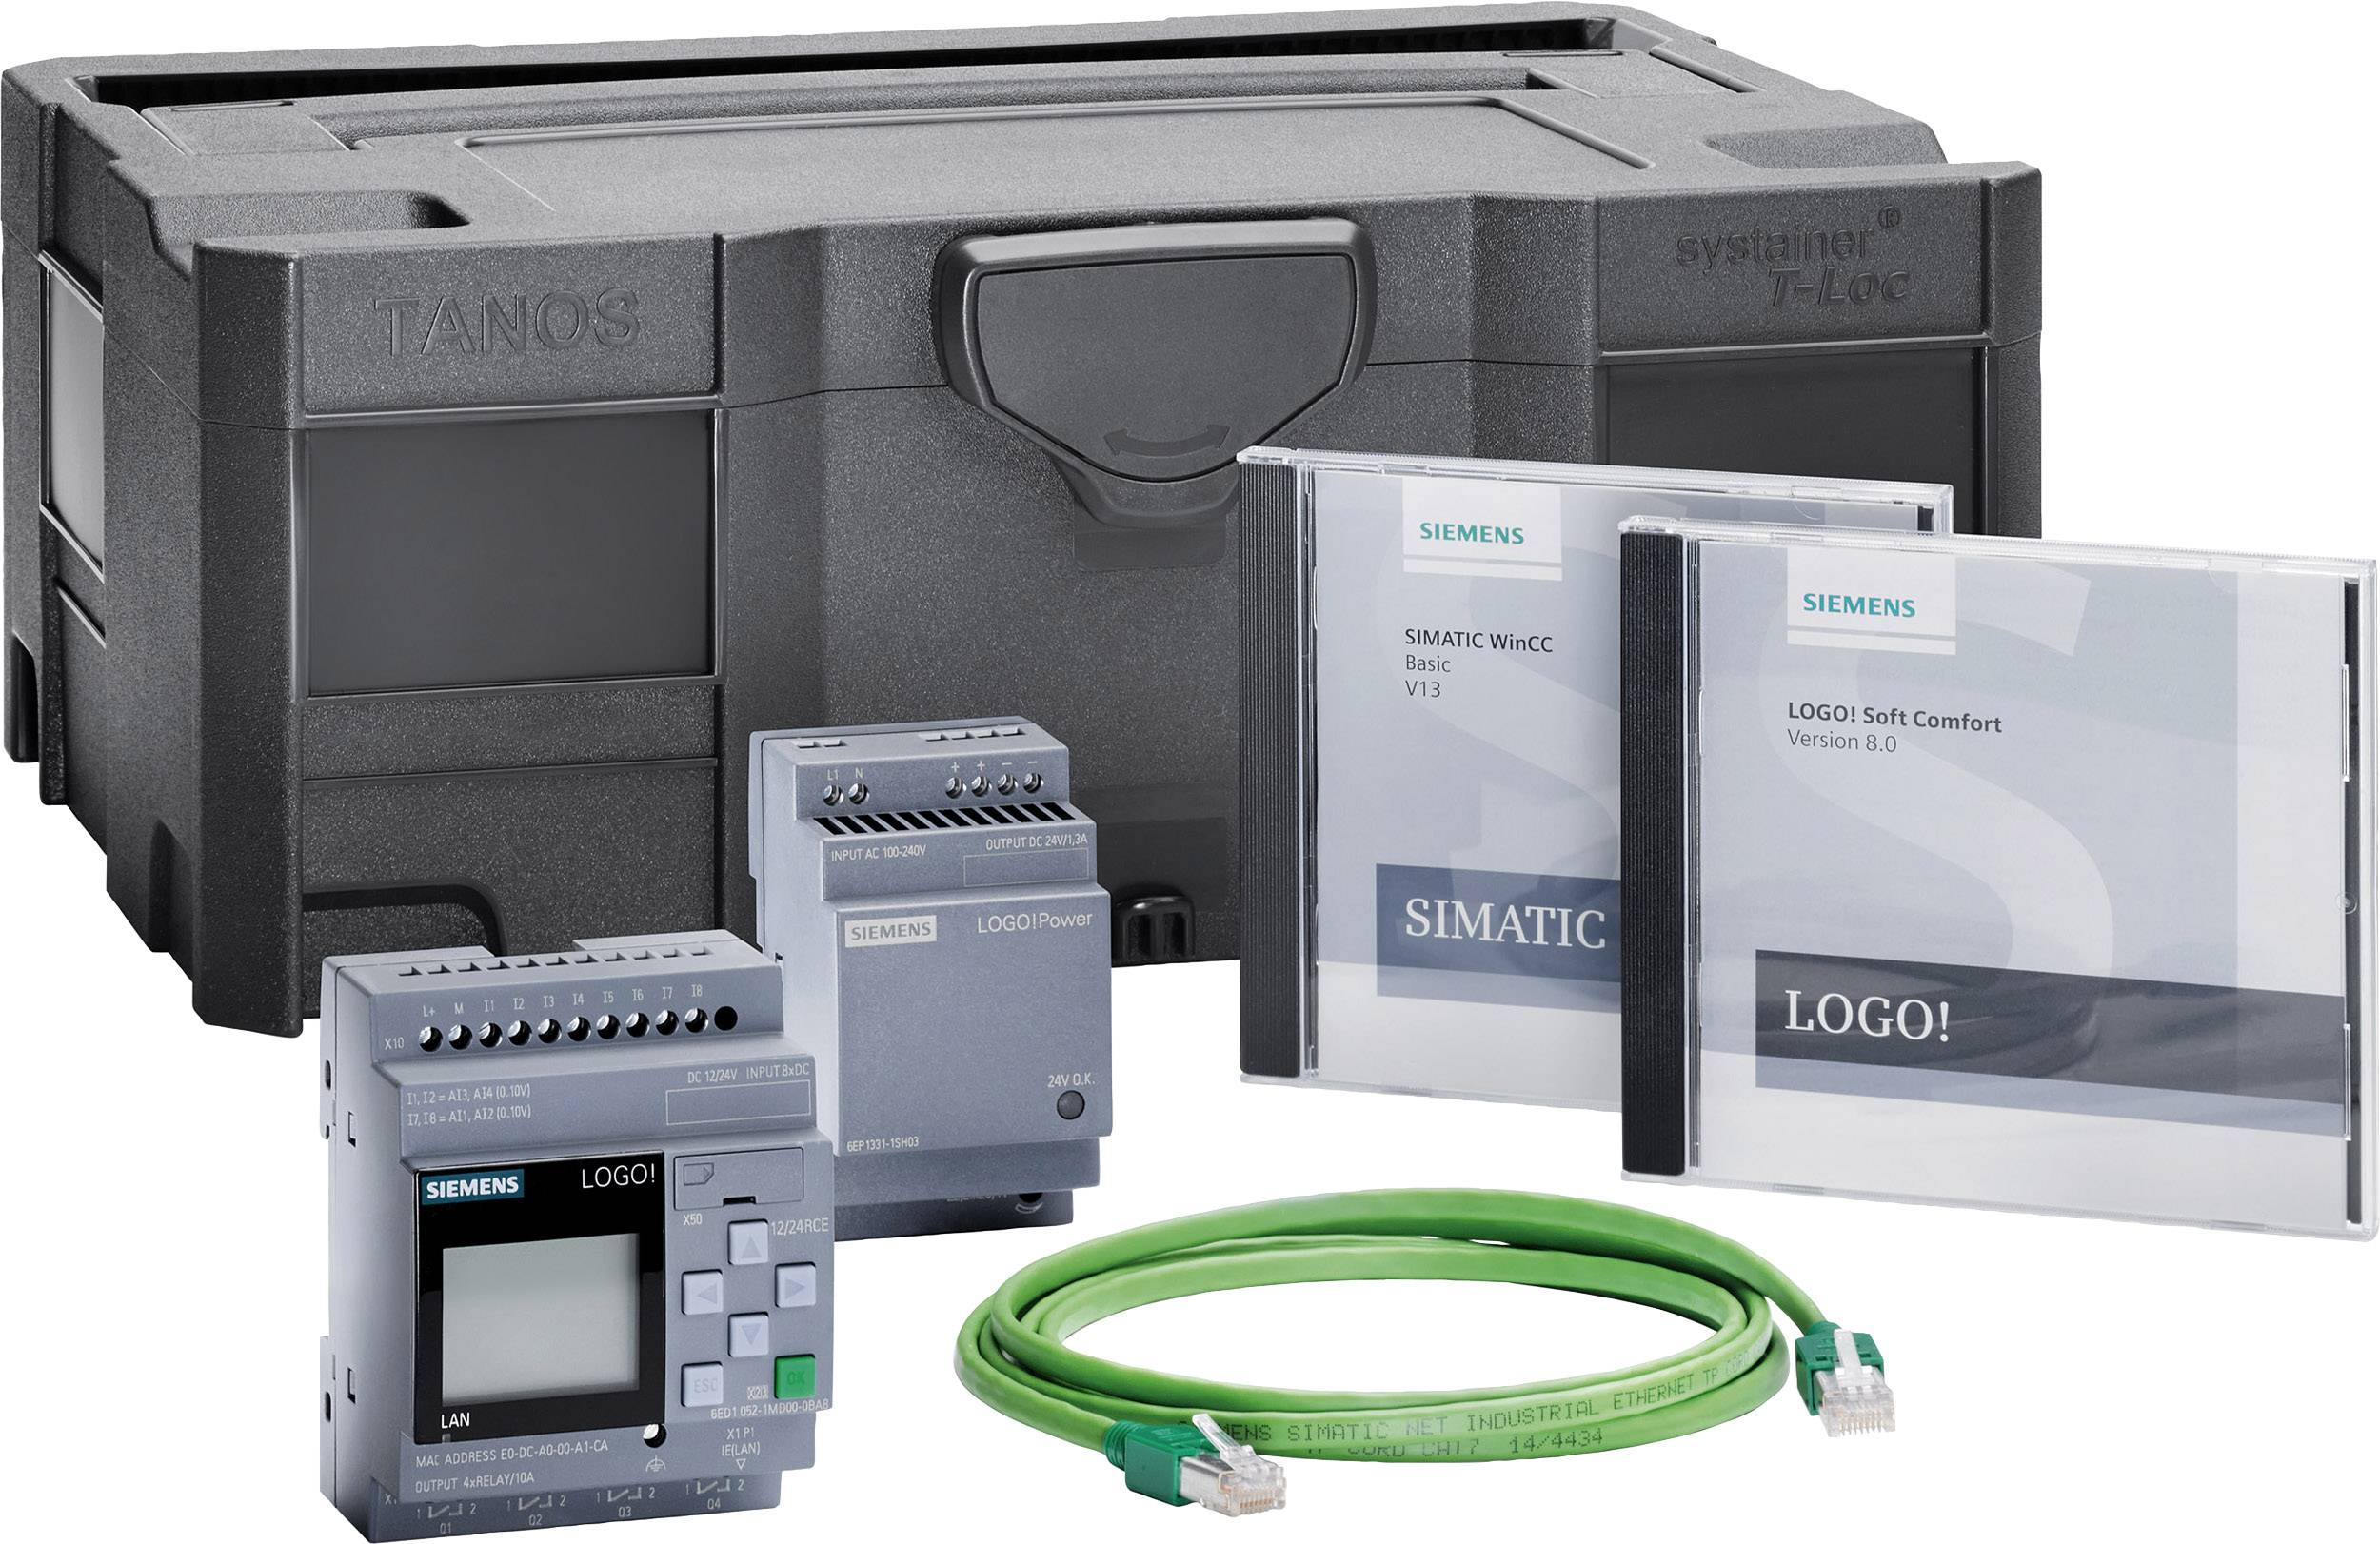 Štartovacia súprava Siemens LOGO! STARTER KIT 12/24RCE 6ED1057-3BA01-0AA8, 12 V/DC, 24 V/DC